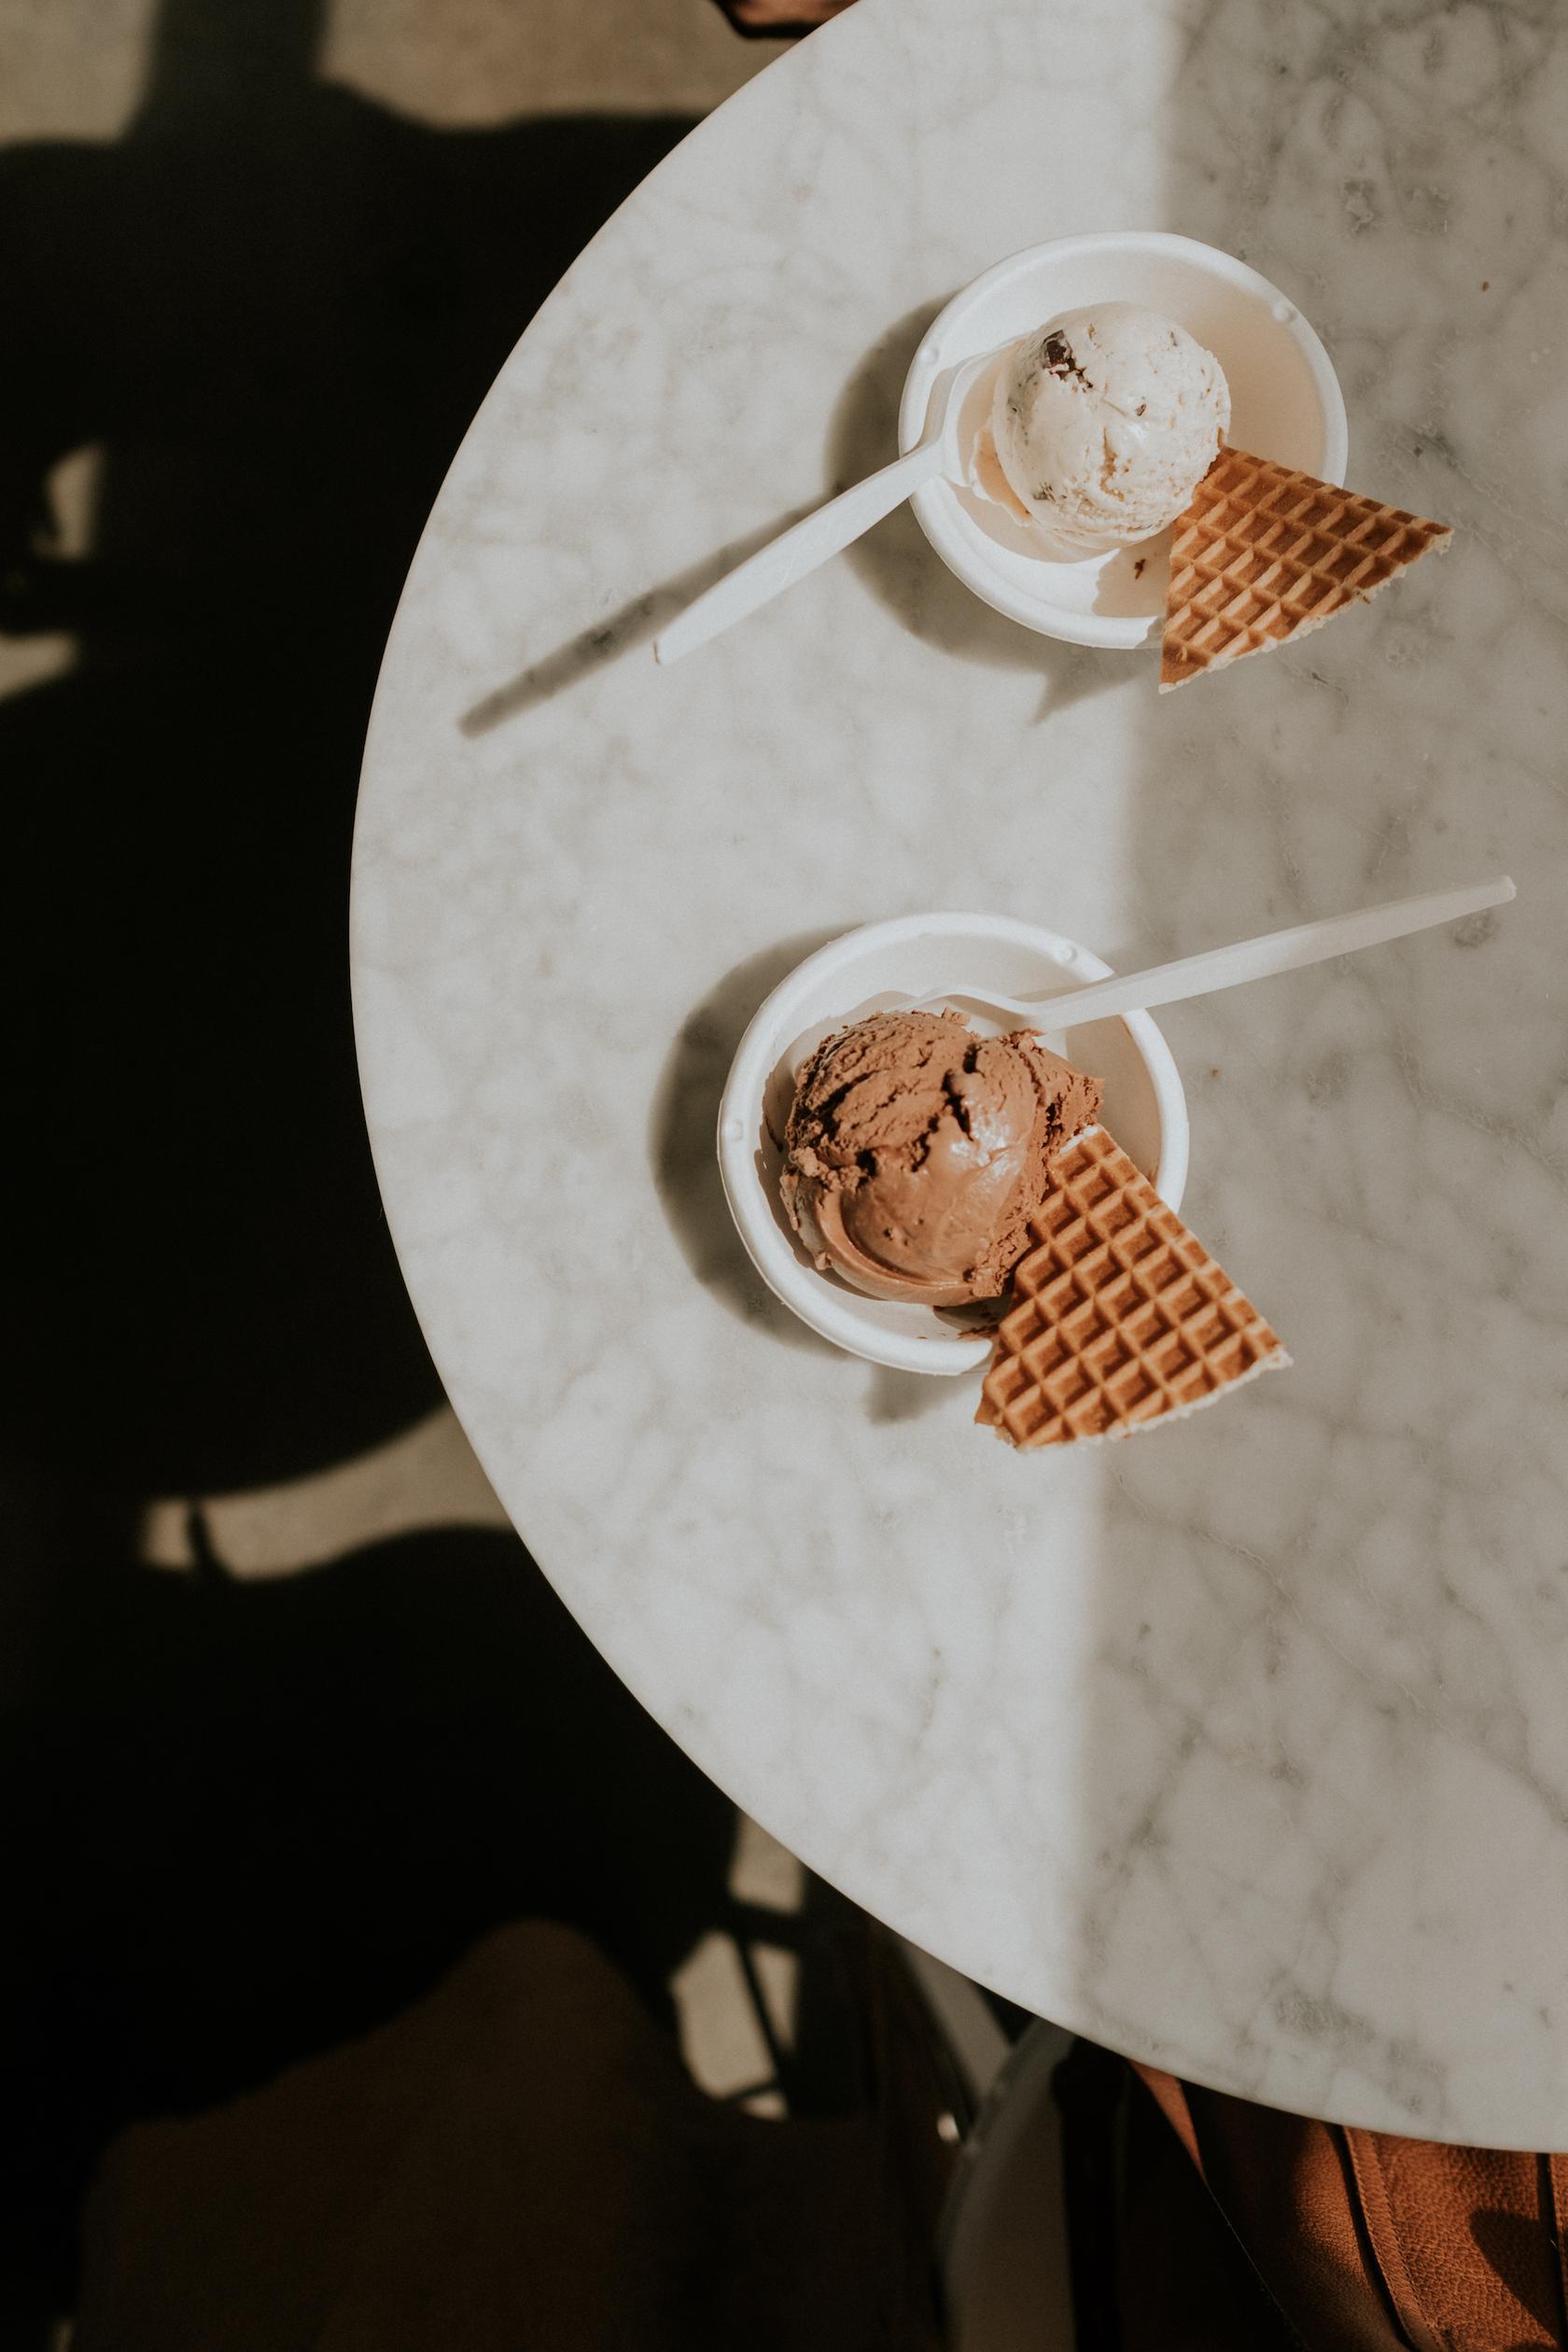 Top: Salted Peanut Butter with Chocolate Flecks  Bottom: Dairy-Free Dark Chocolate Truffle